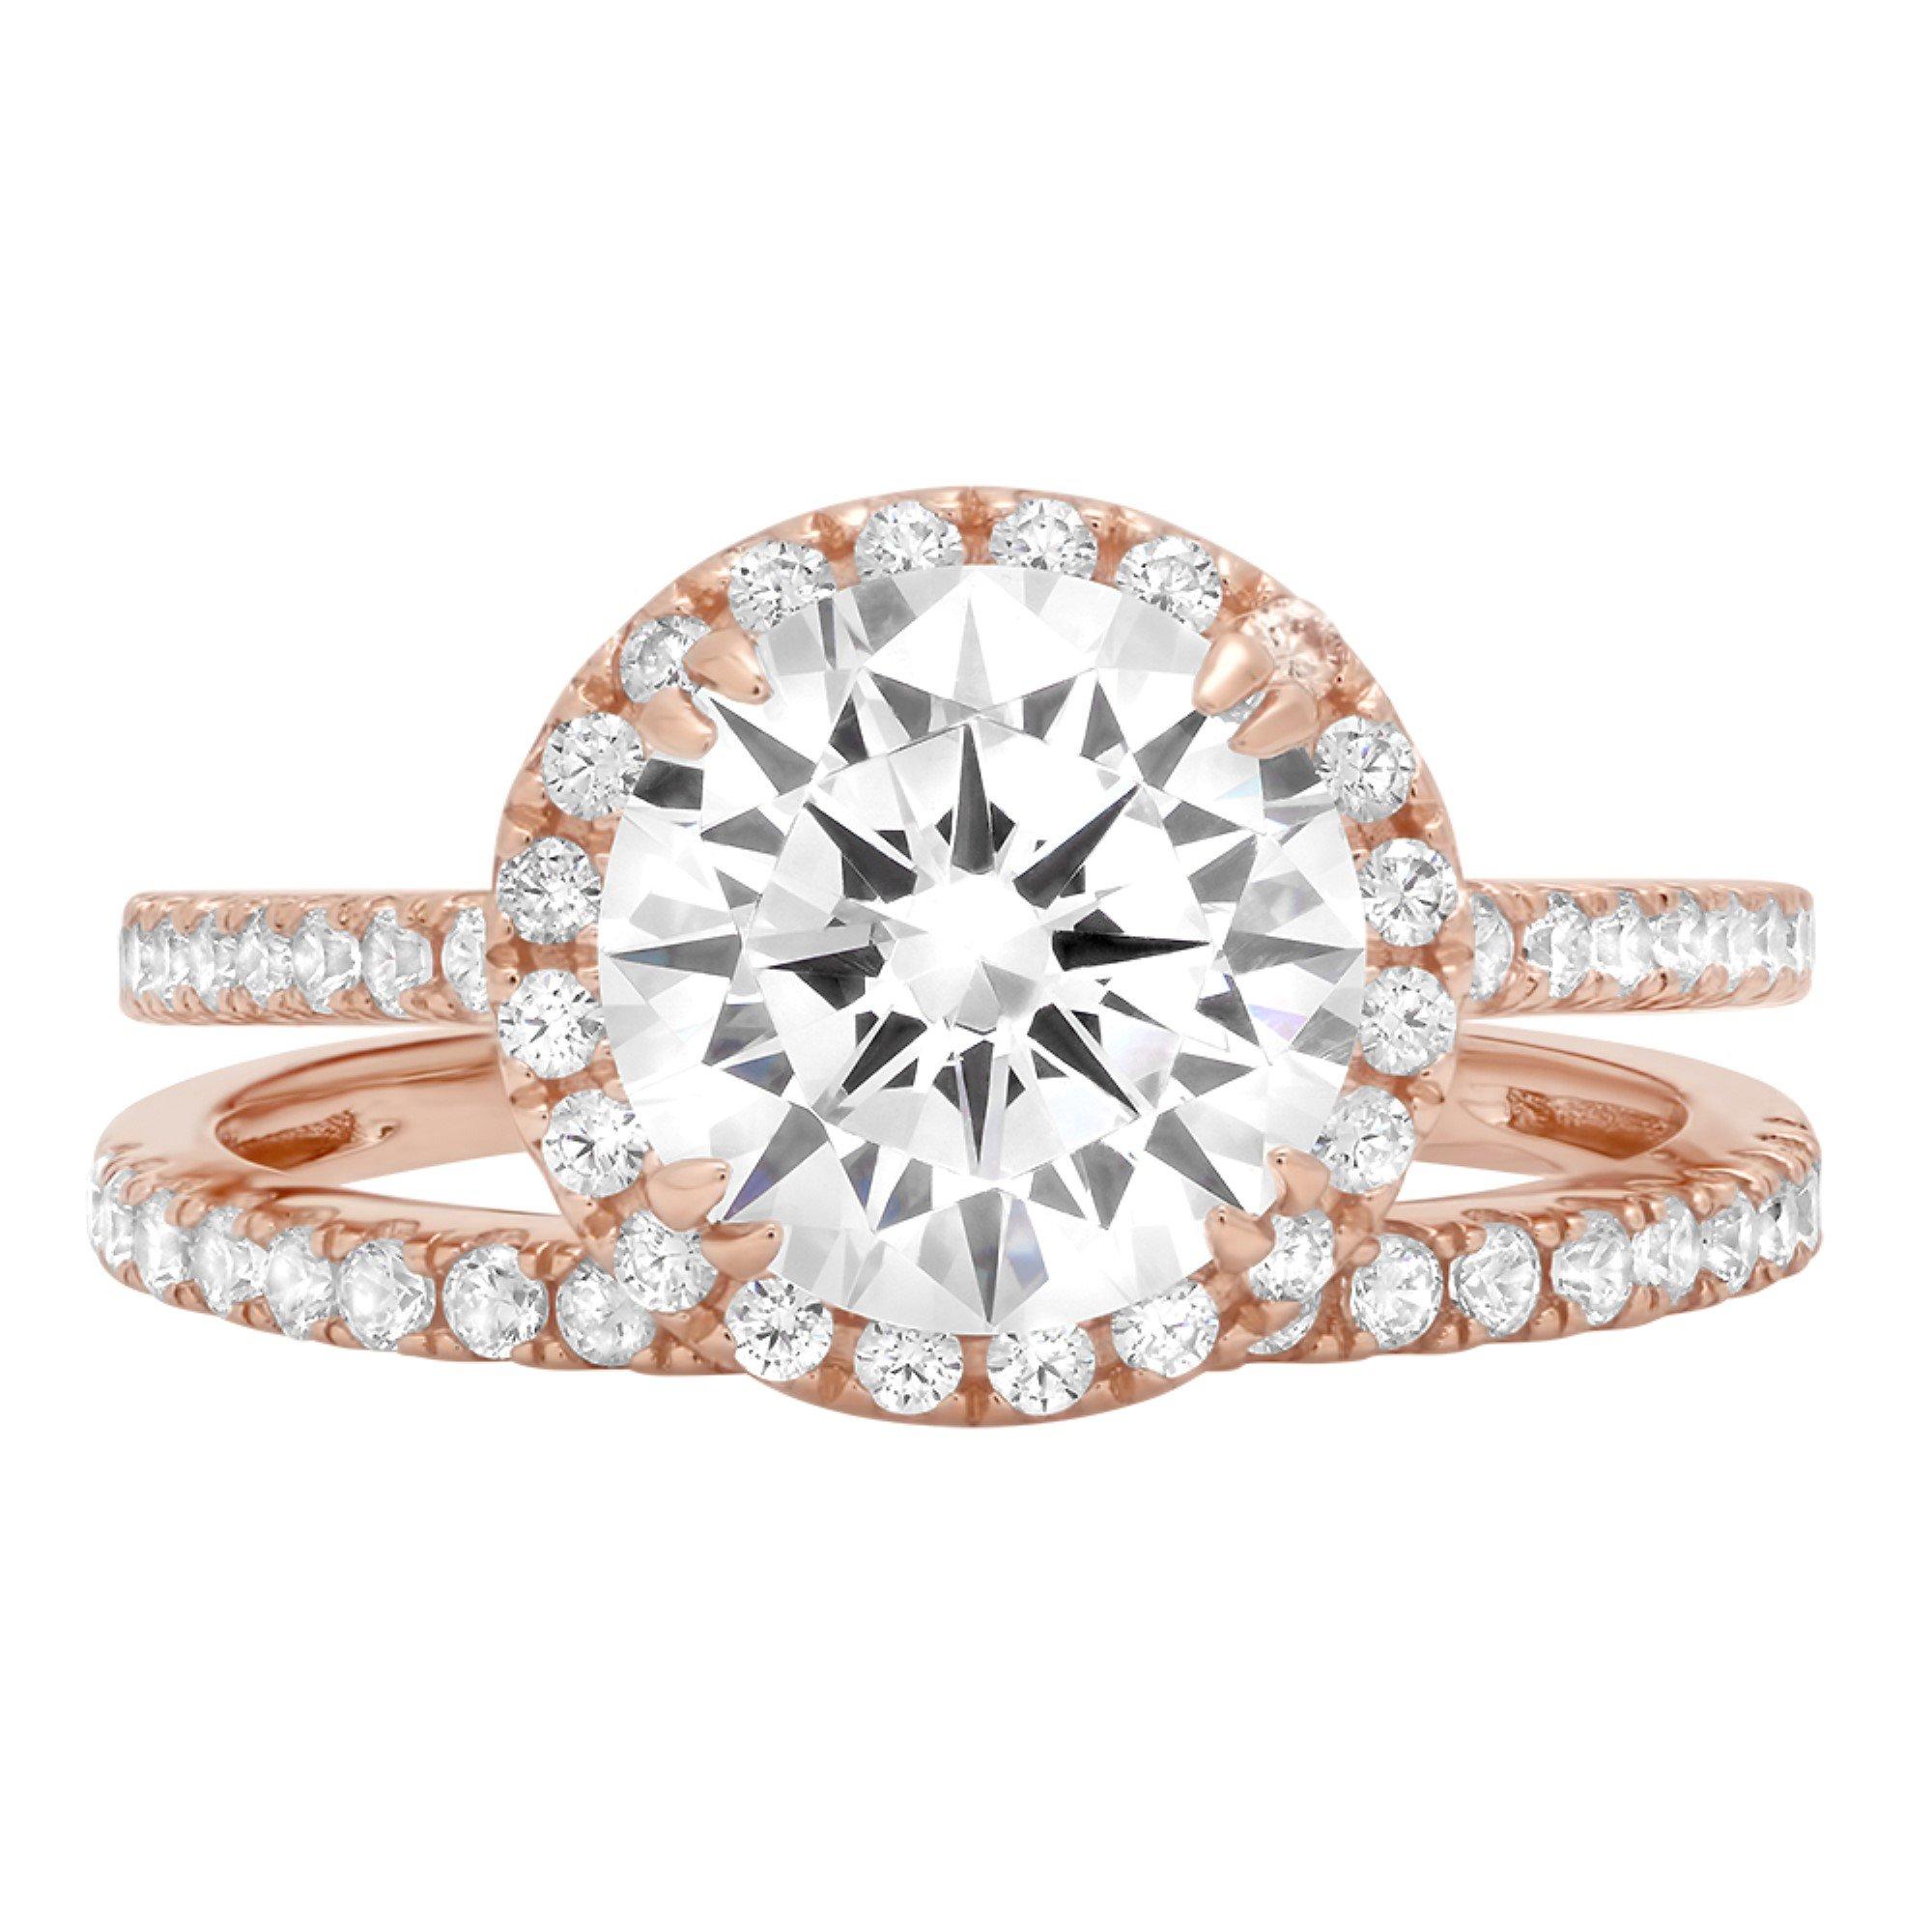 2.92ct Brilliant Round Cut Halo Bridal Engagement Statement Wedding Ring Band Set 14k Rose Gold, 10